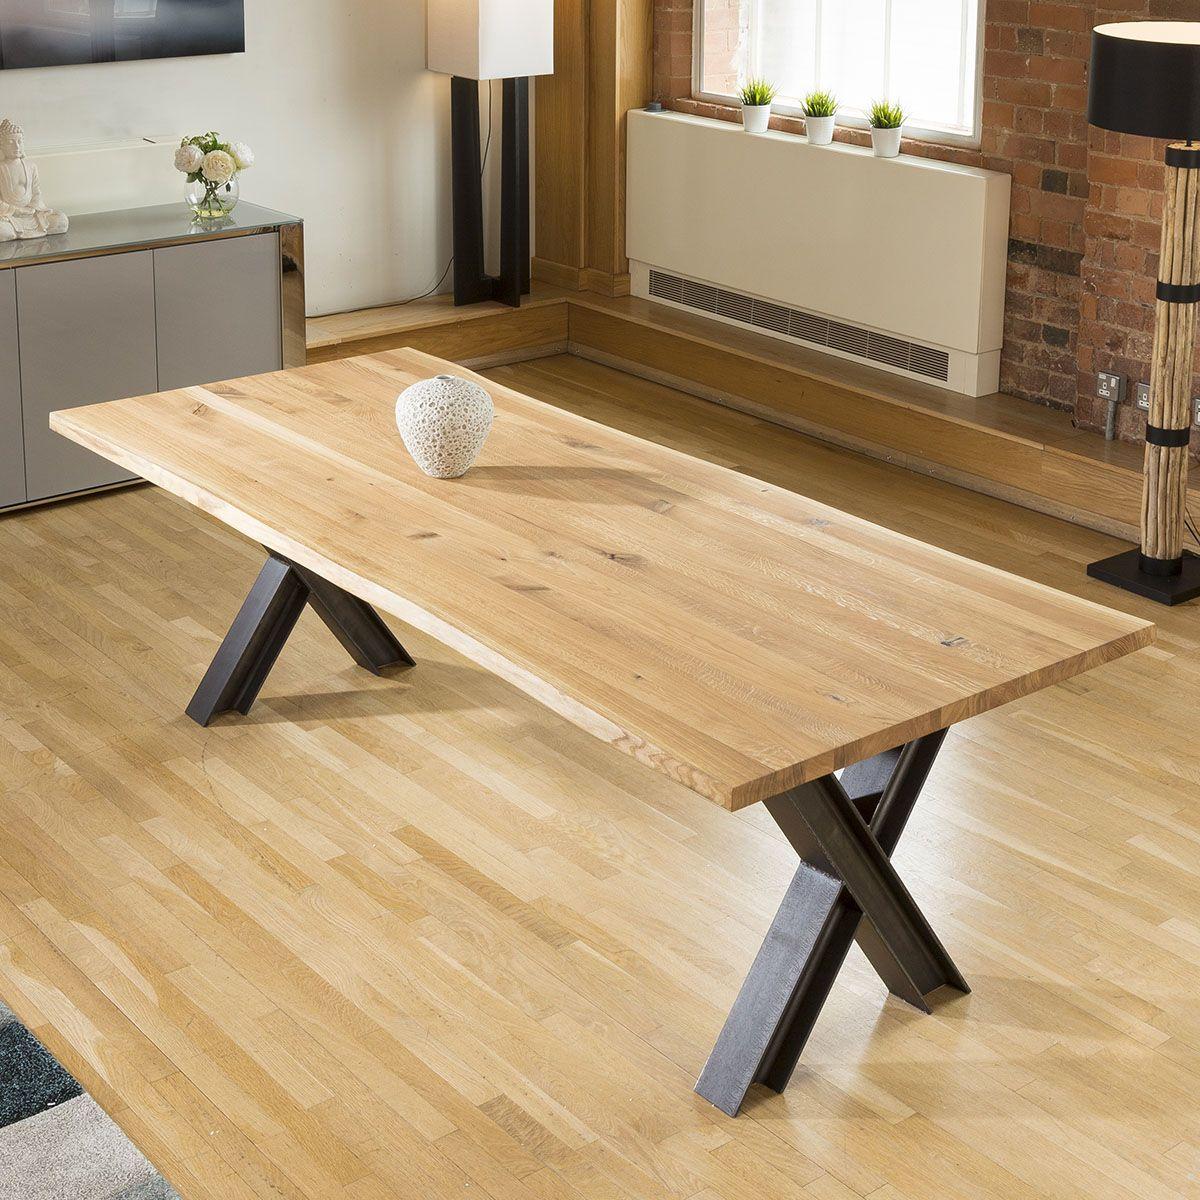 Venus Solid Oak Custom Made Dining Table Colour Choices 2000x1000mm Solid Oak Dining Table Dining Table Oak Dining Table